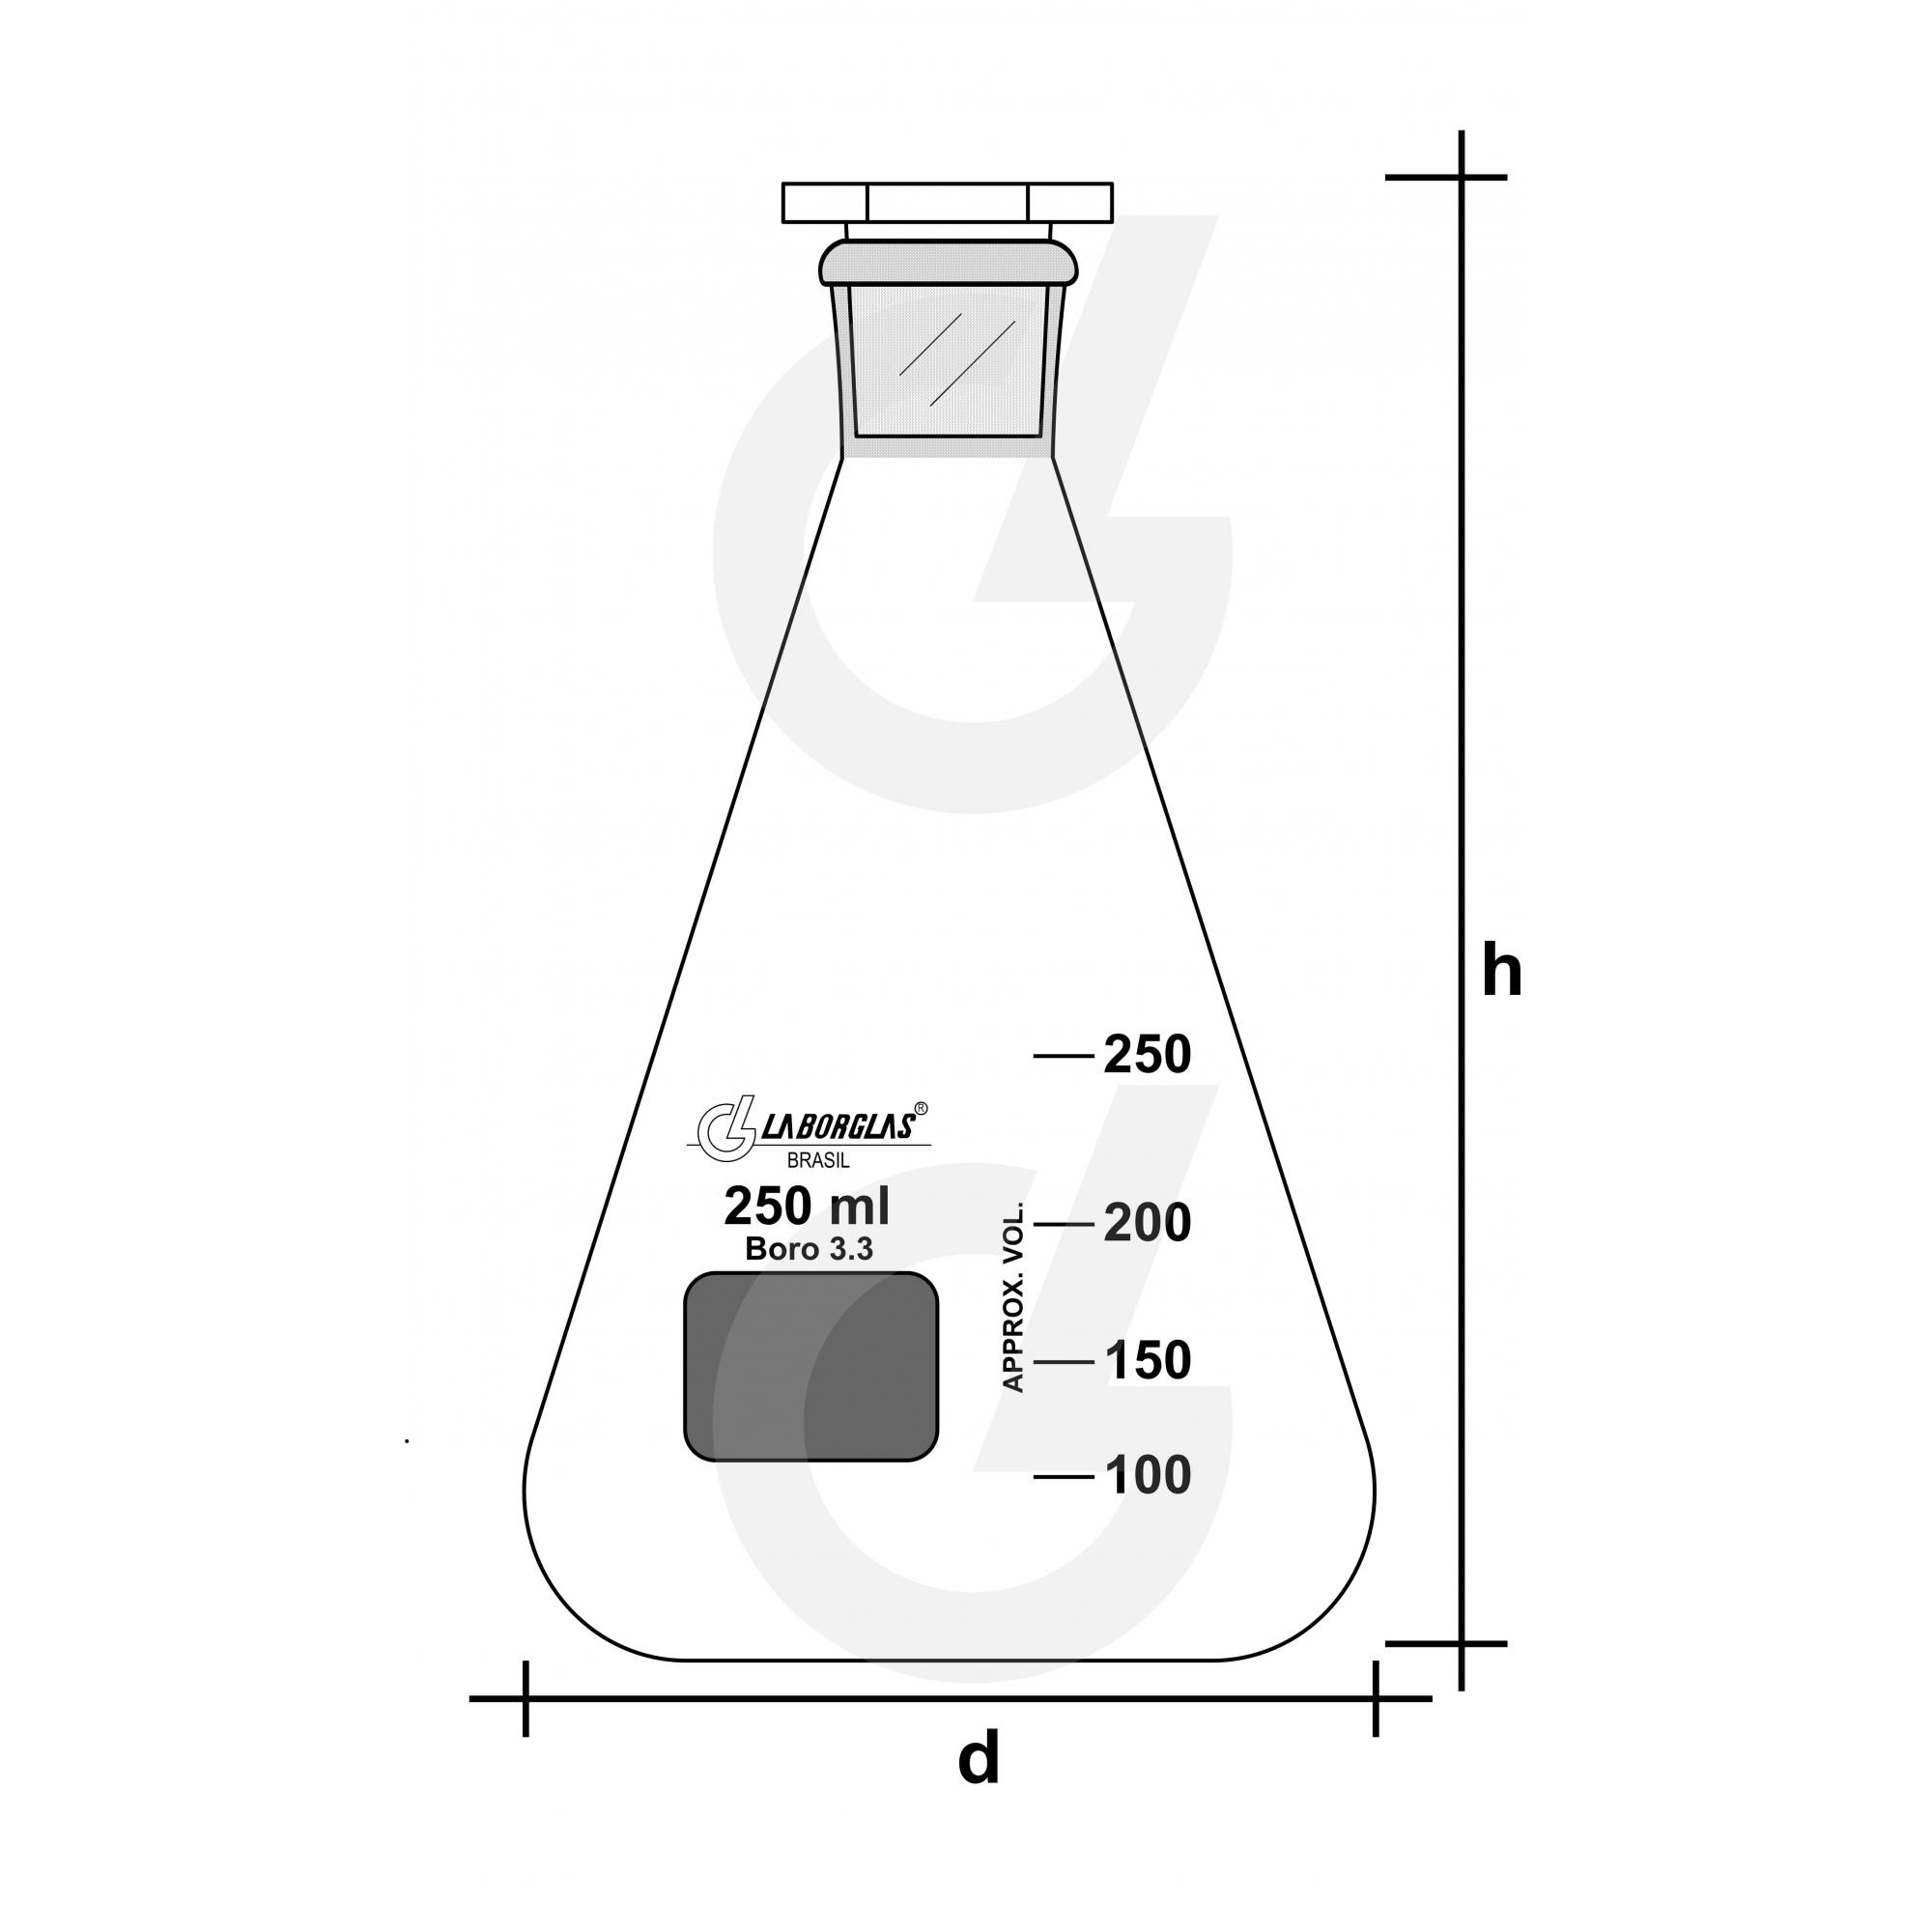 FRASCO ERLENMEYER C/ ROLHA VIDRO 250 ML - Laborglas - Cód. 91216393